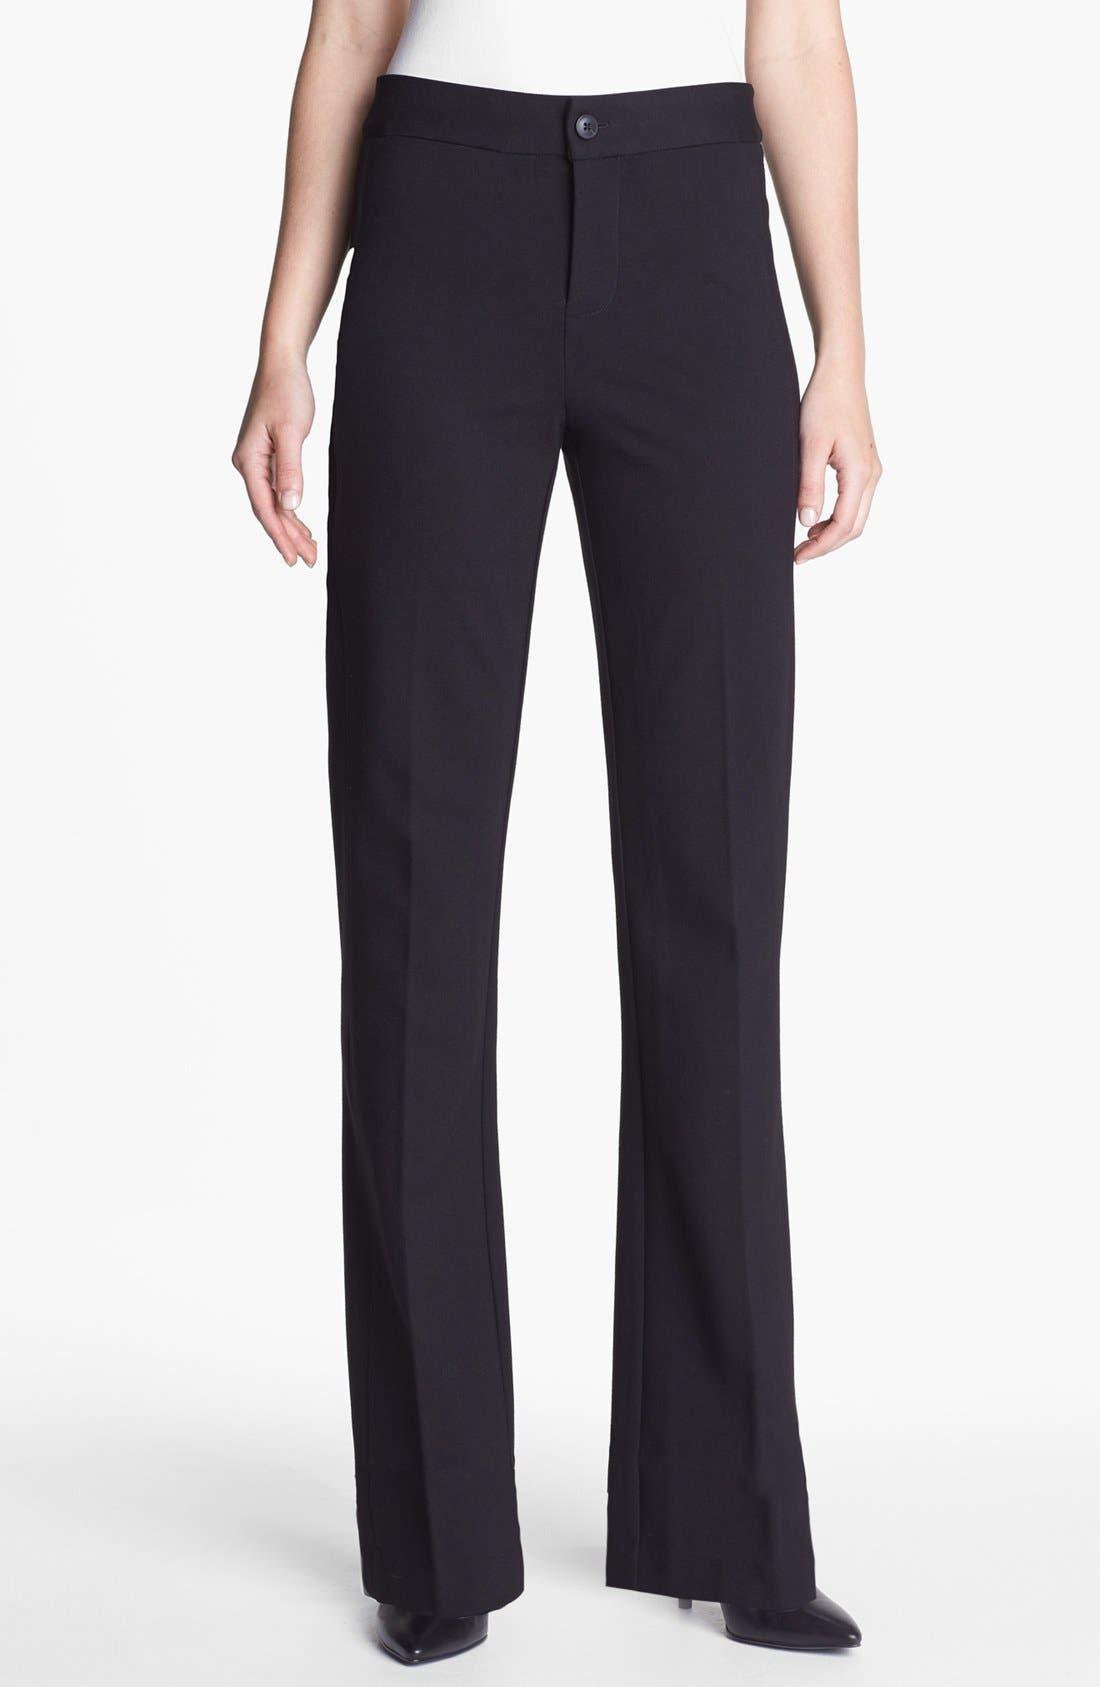 Main Image - NYDJ Stretch Ponte Trousers (Regular & Petite)